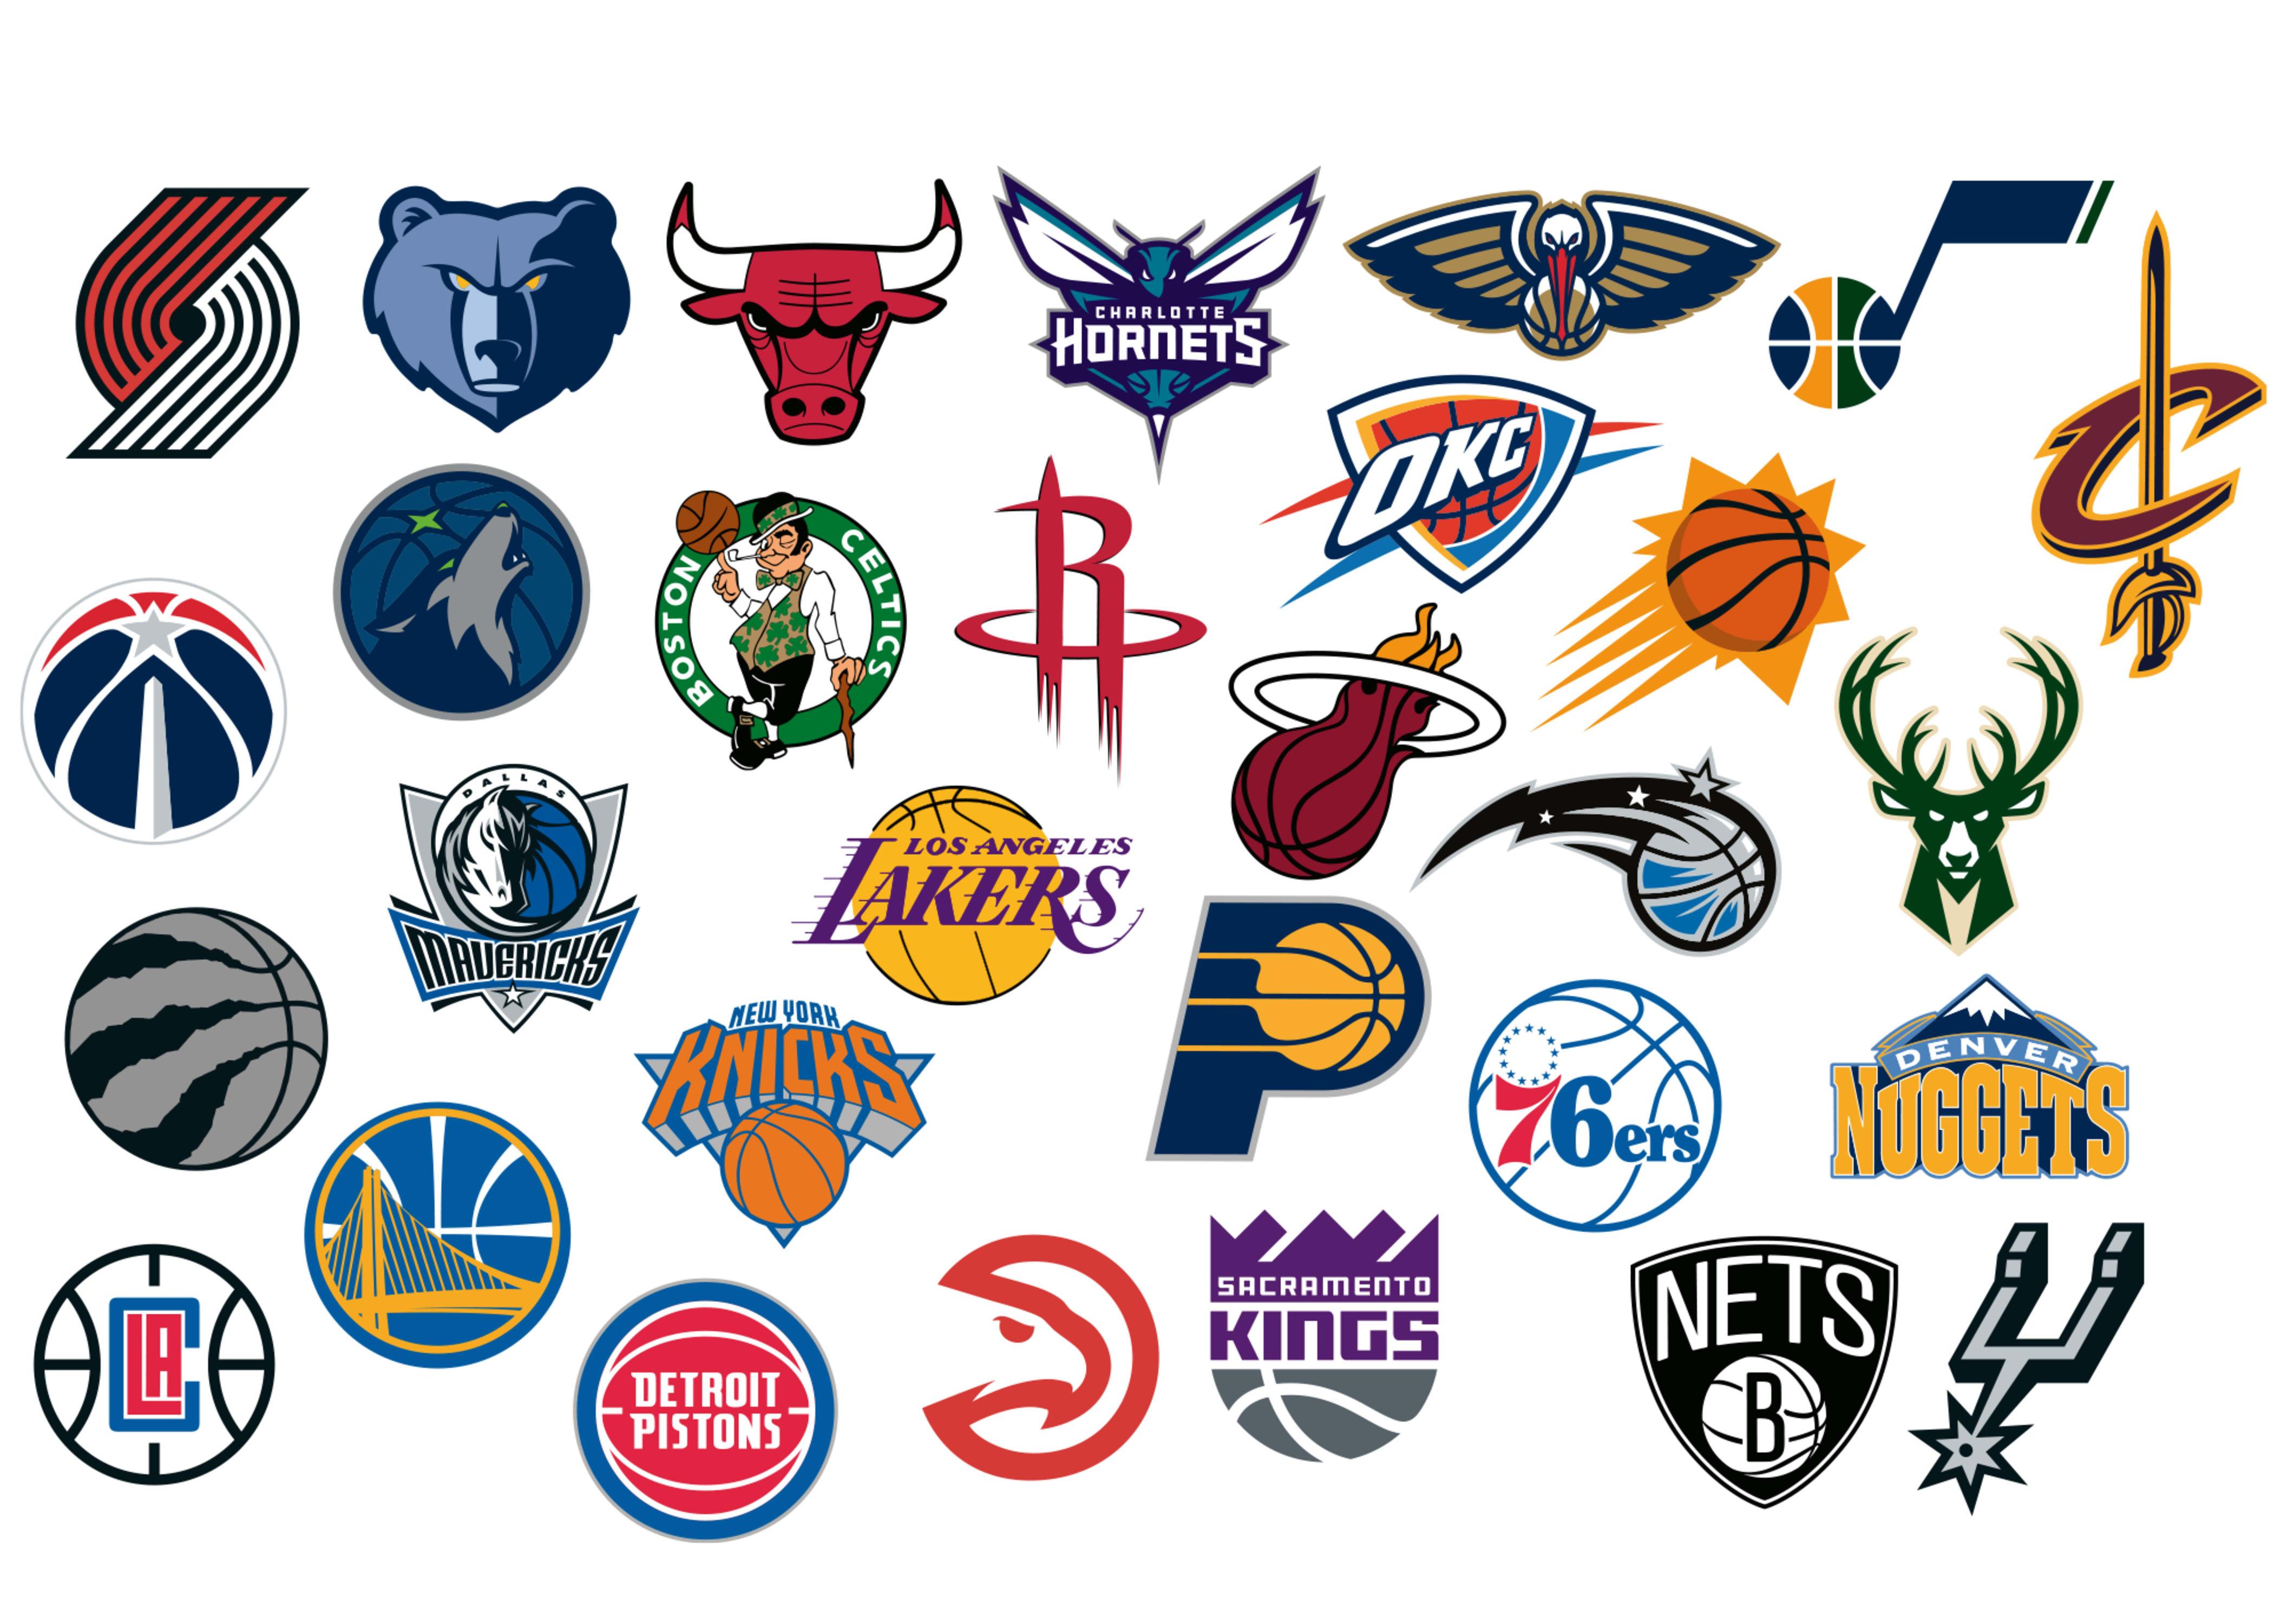 97+ NBA 2018 Wallpapers on WallpaperSafari